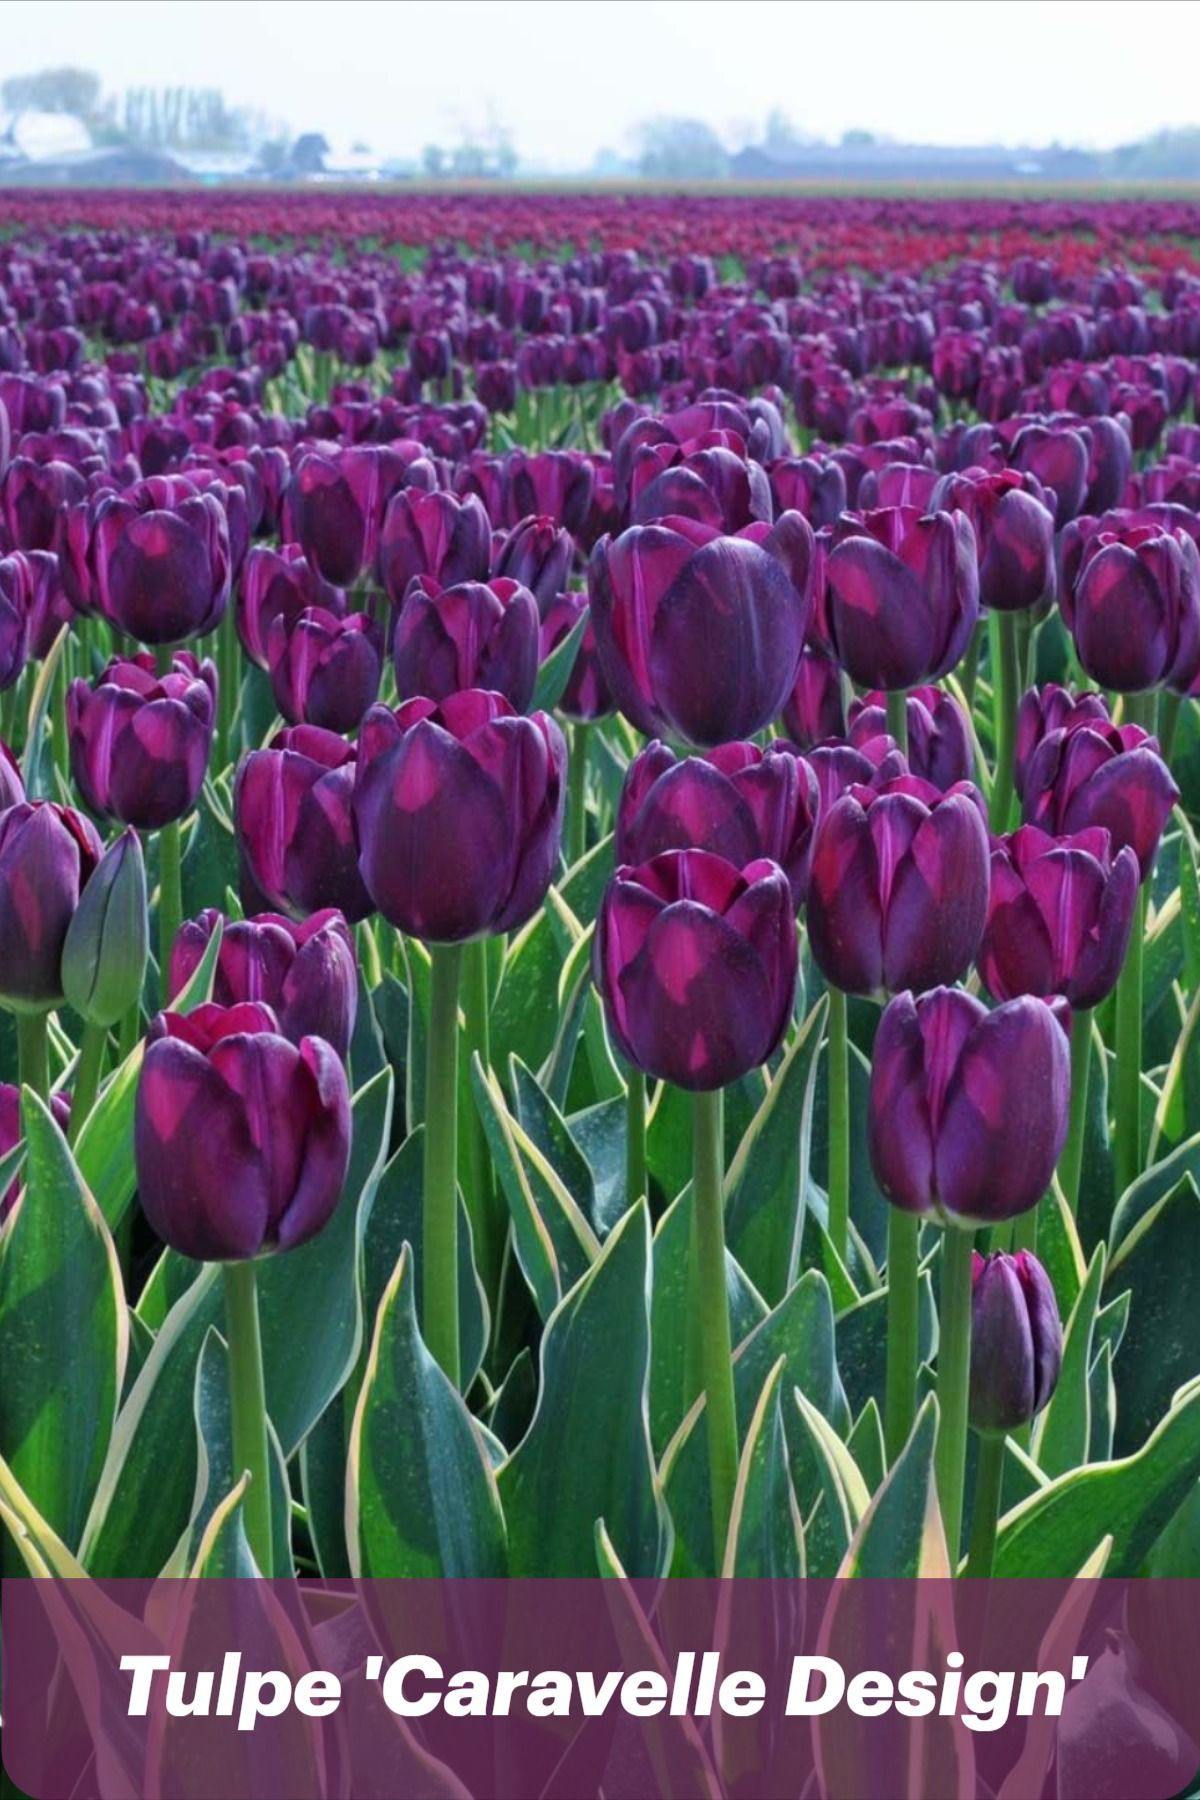 Tulpe Caravelle Design Lila Garten Tulpen Lila Bluten